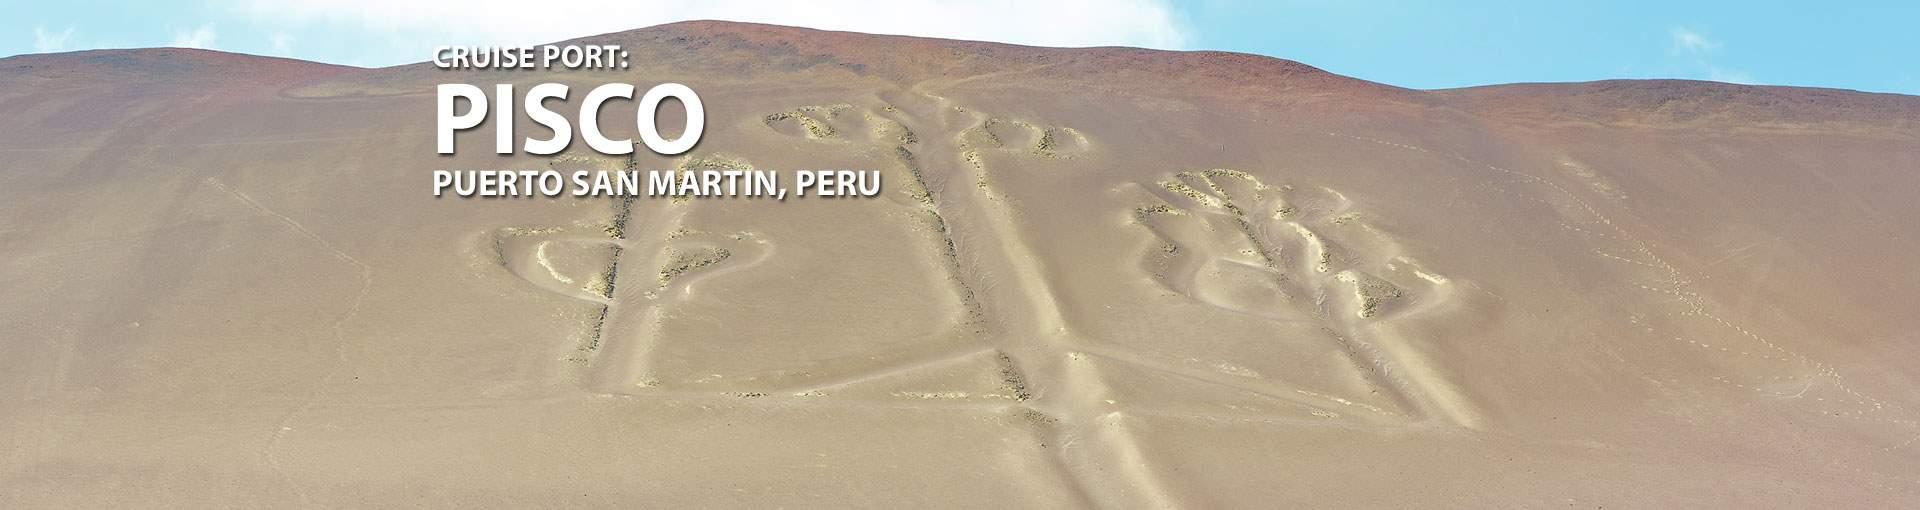 Cruises to Pisco, Puerto San Martin, Peru